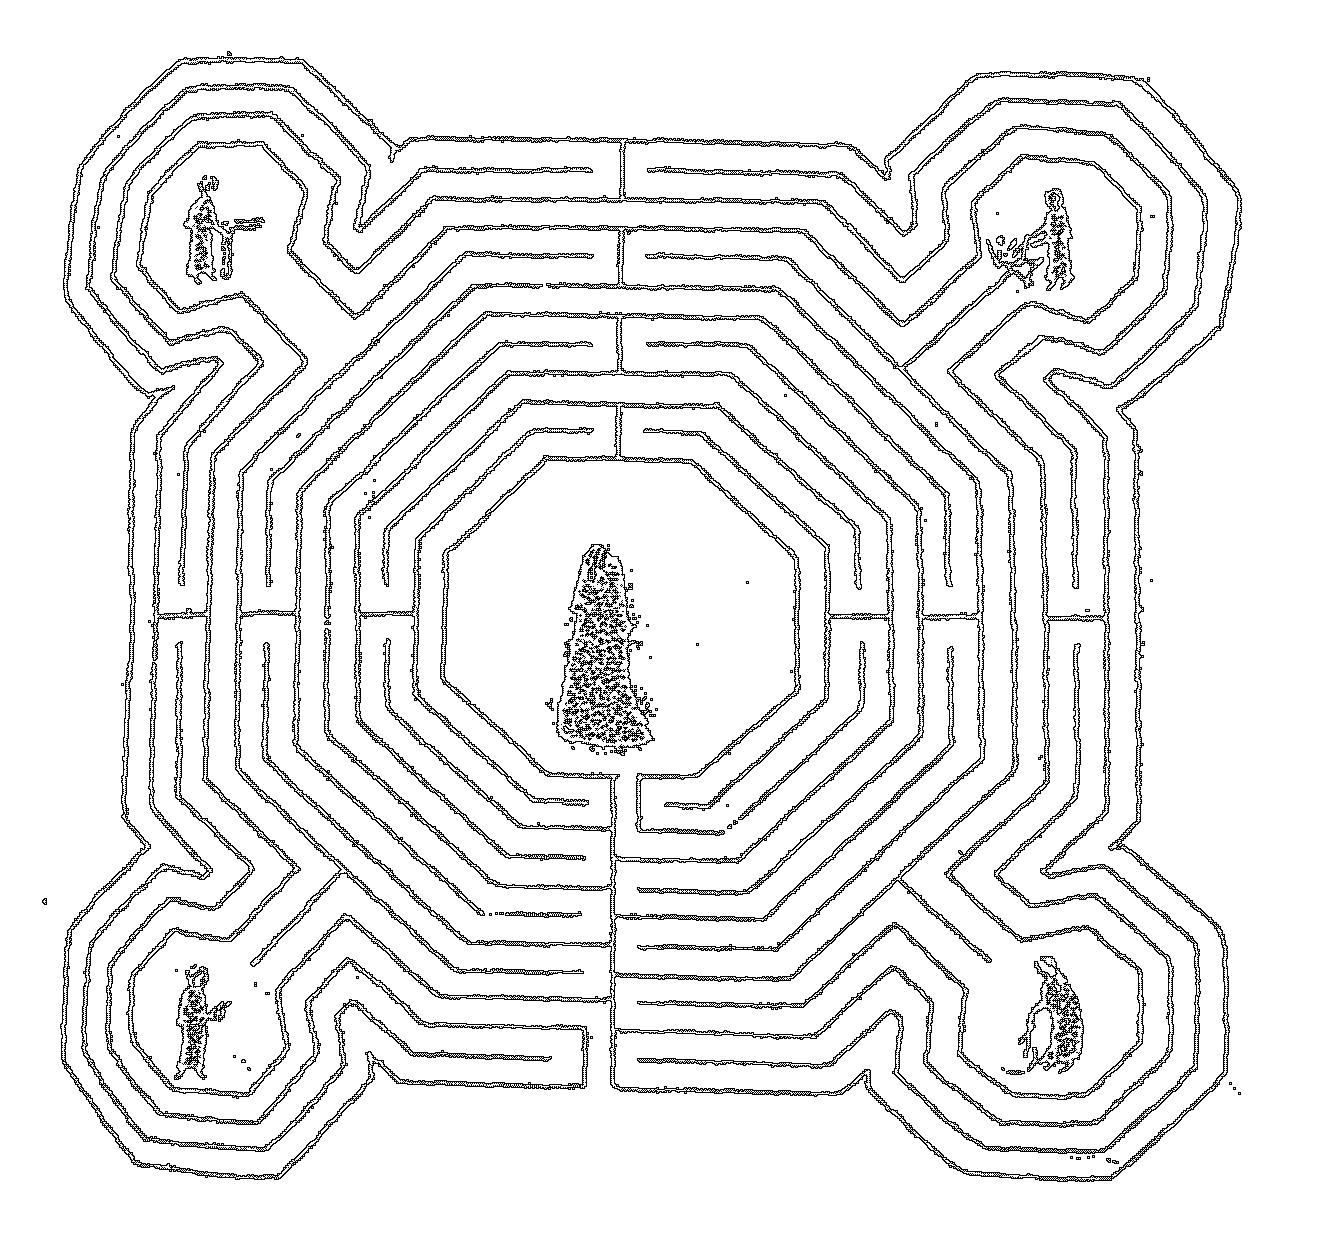 labyrinthe-1